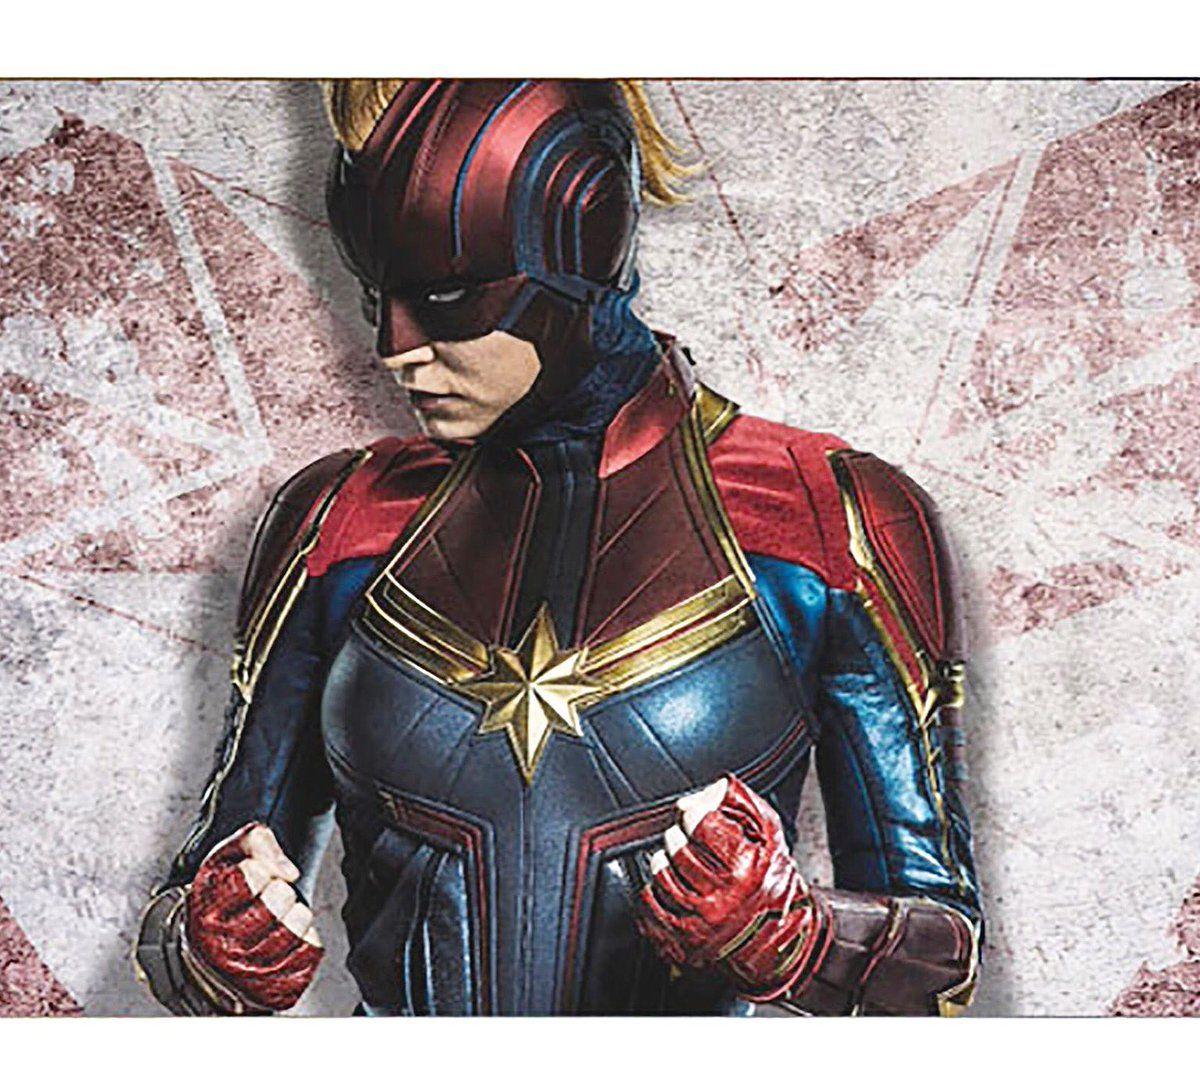 Captain-Marvel-Focus.jpg?q=50&fit=crop&w